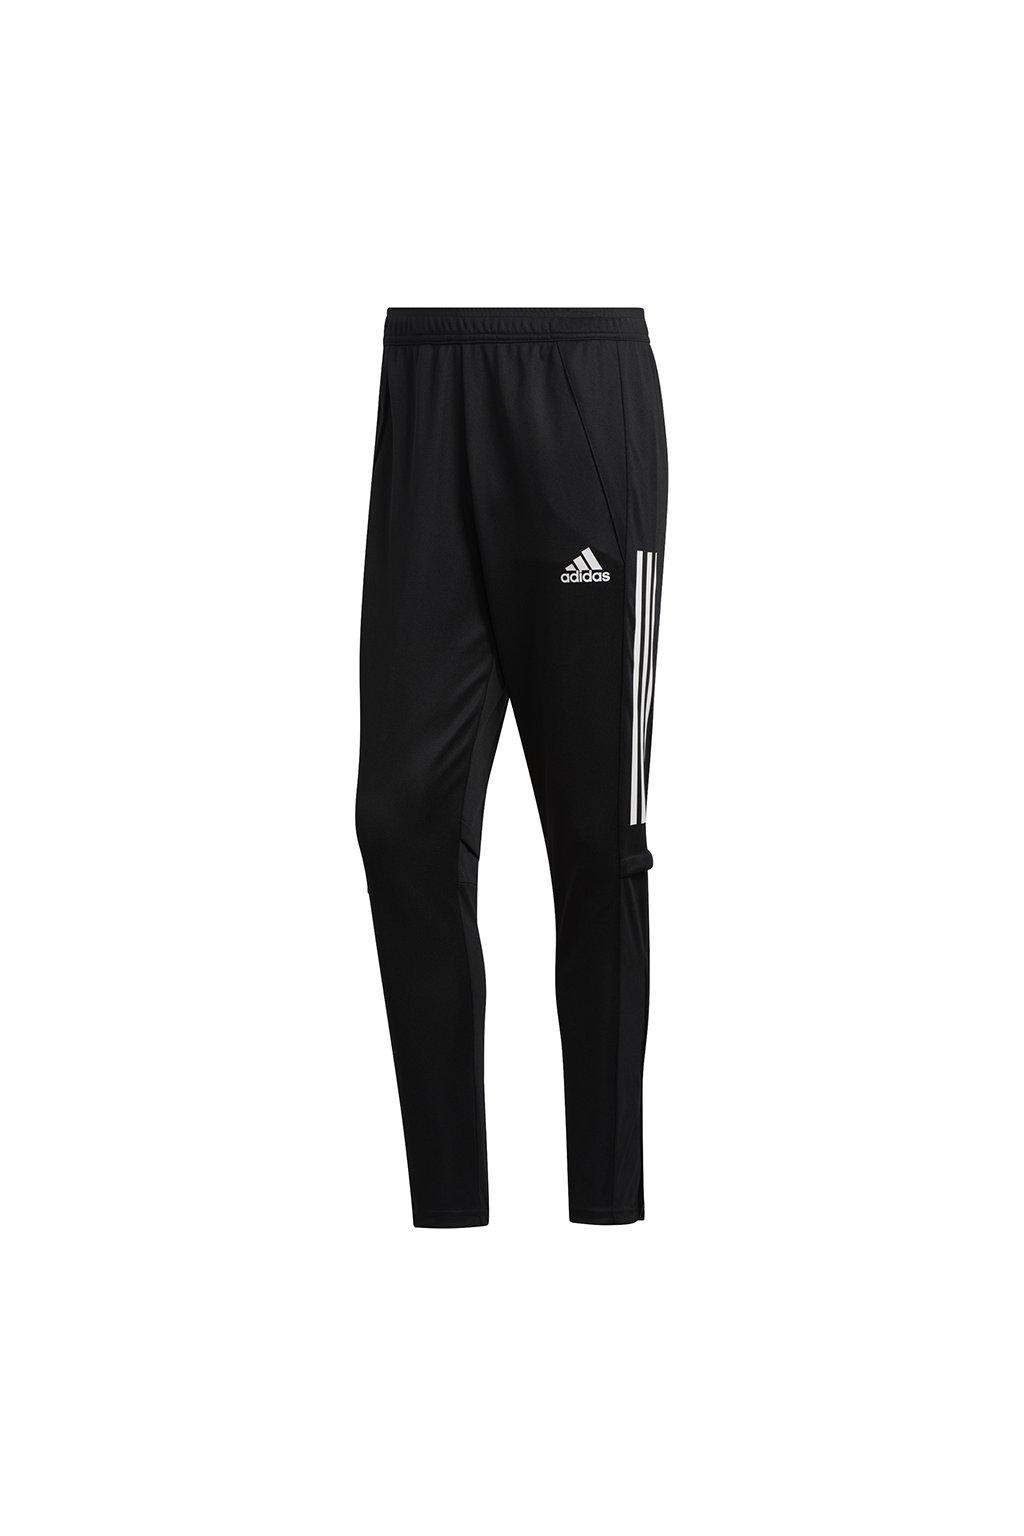 Pánske nohavice Adidas Condivo 20 Training Pant black EA2475